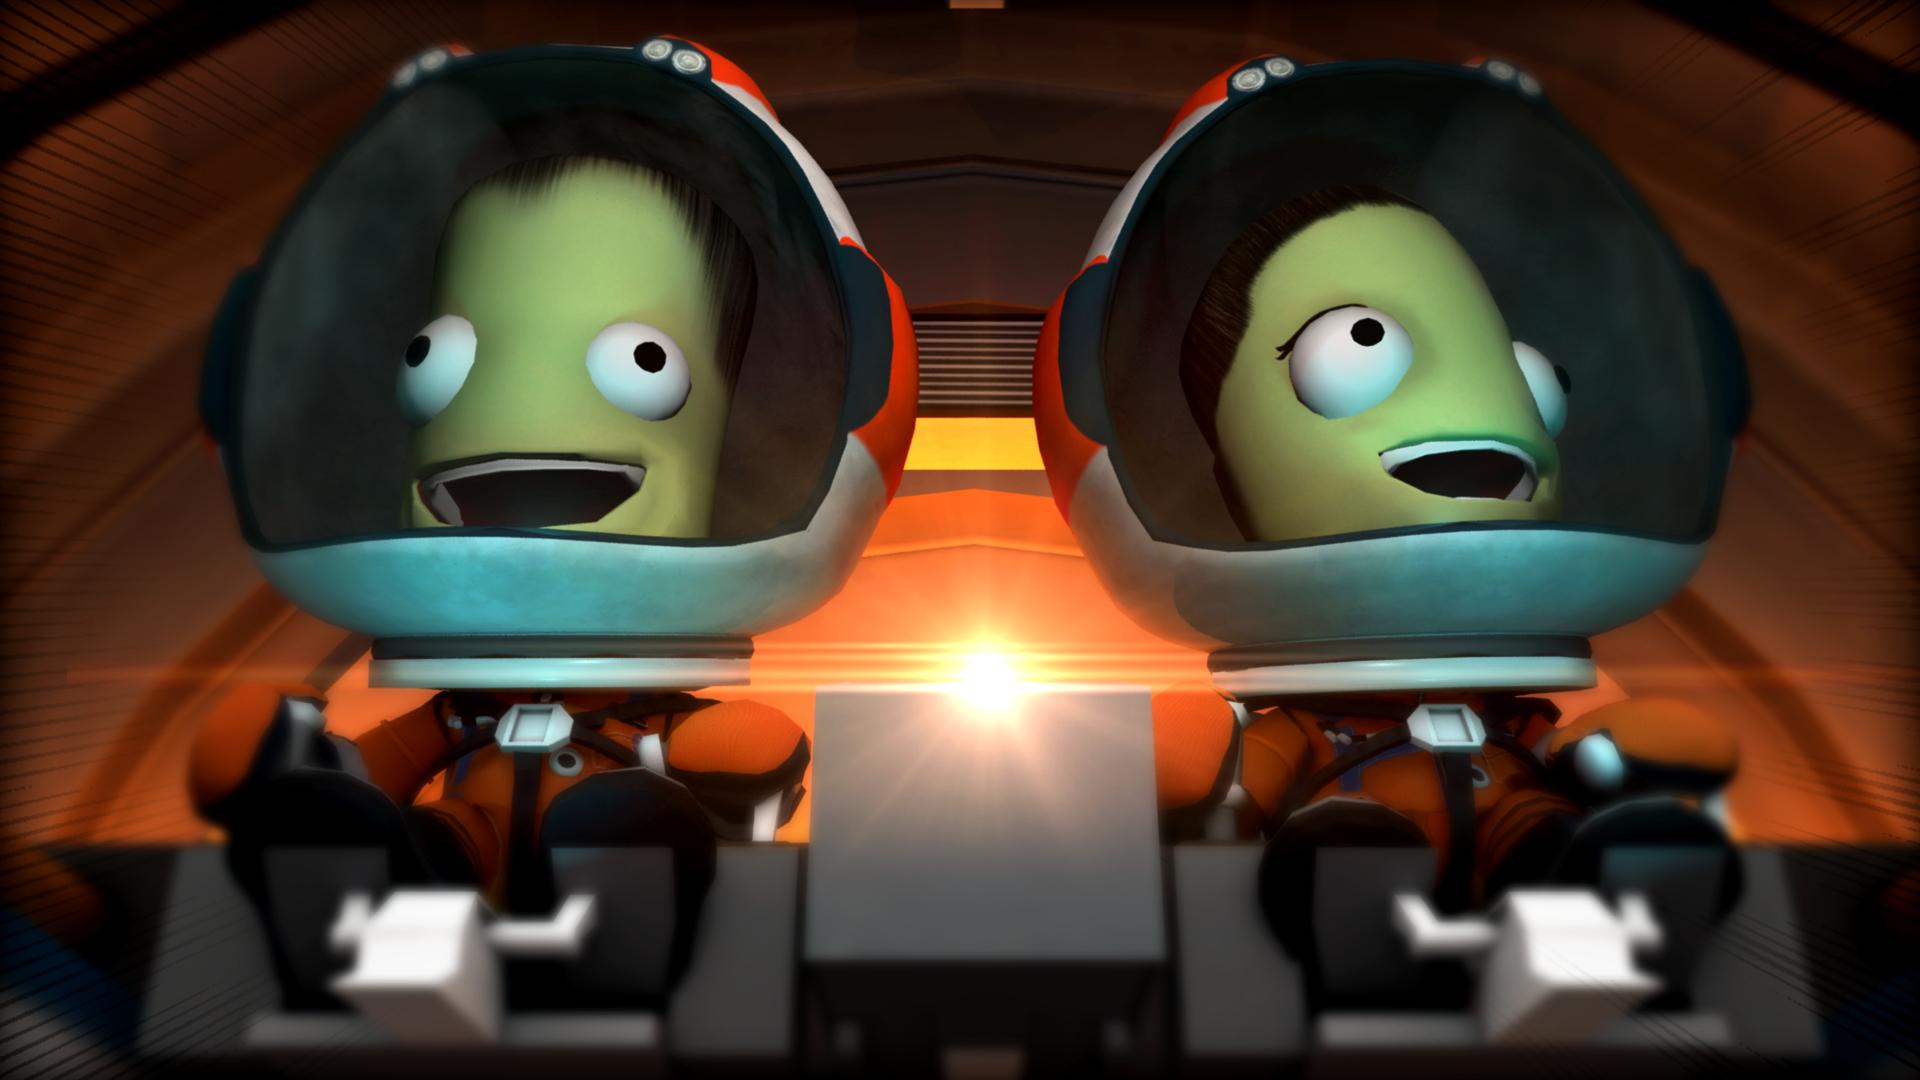 Space, Space, SPAAAACE!